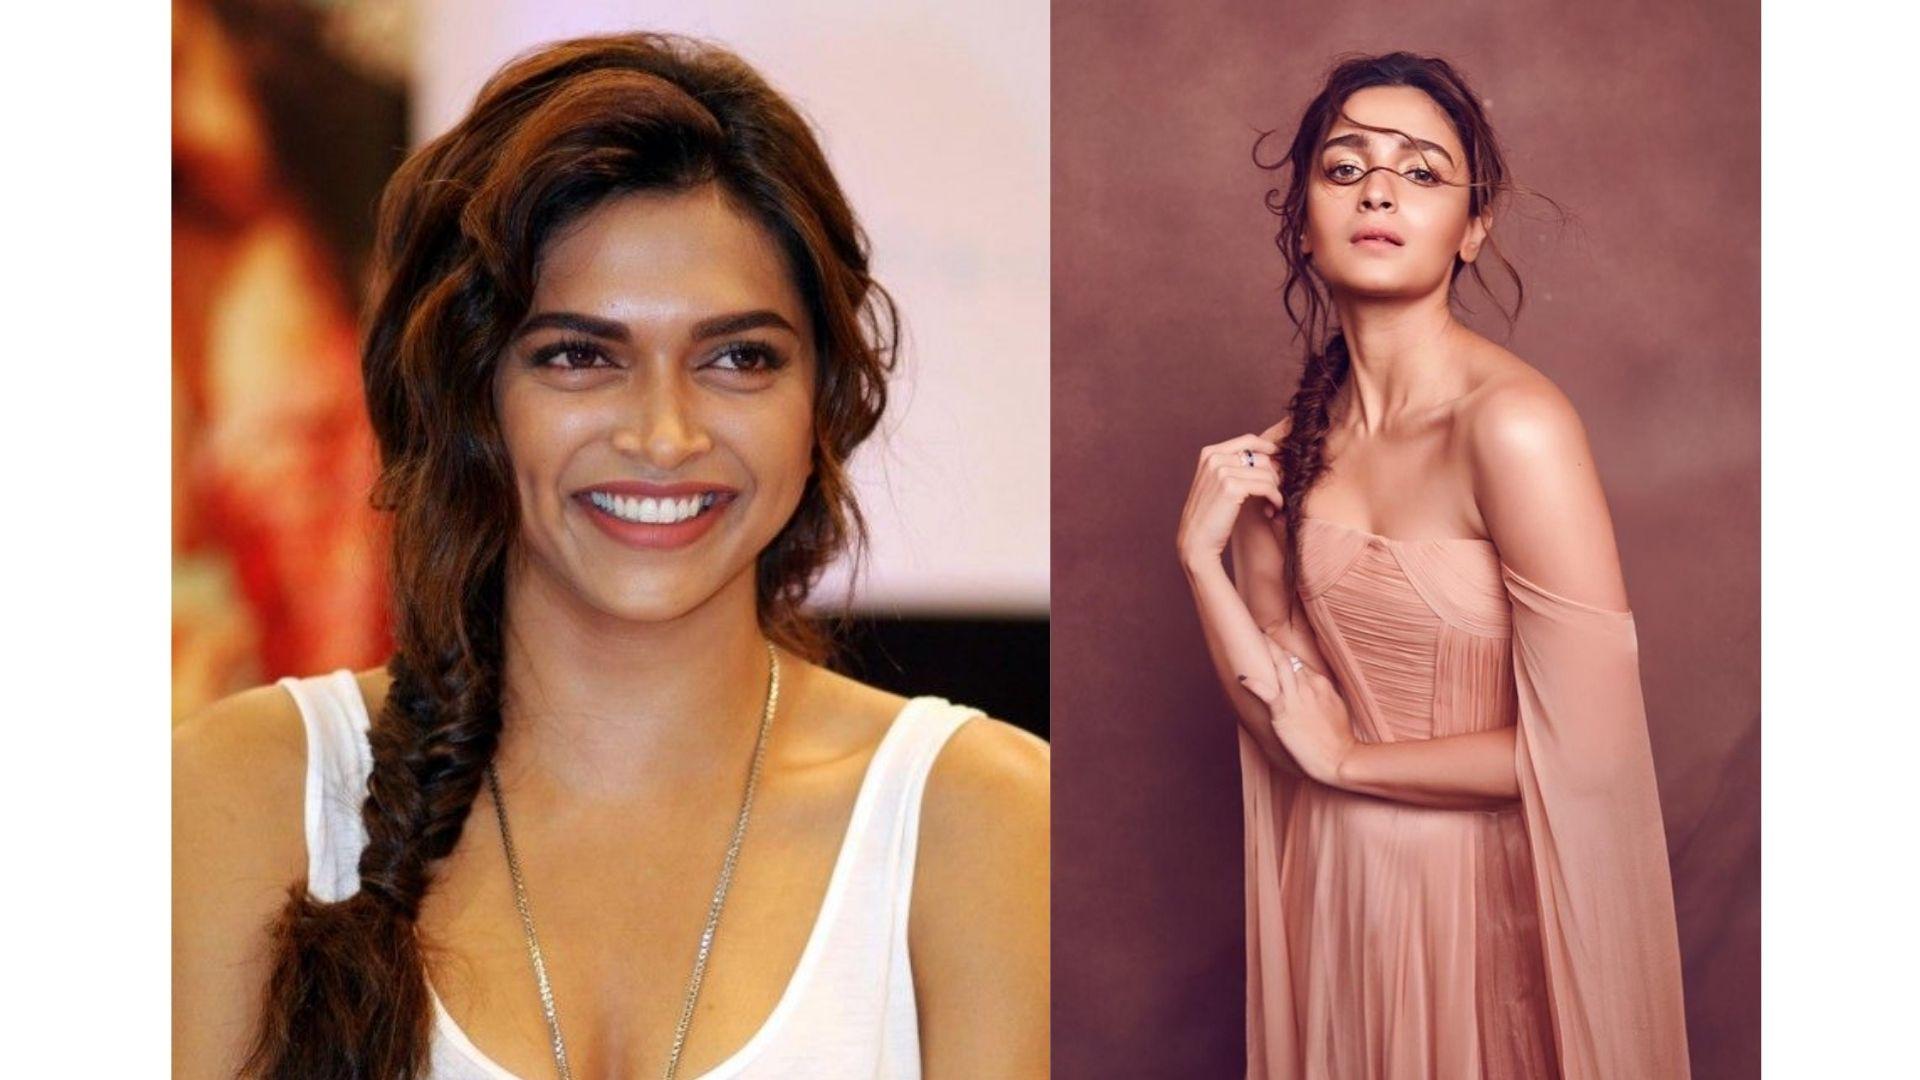 Alia Bhatt, Deepika Padukone- Top 3 Hairstyles Of Bollywood Actresses Which Screamed Hair Goals